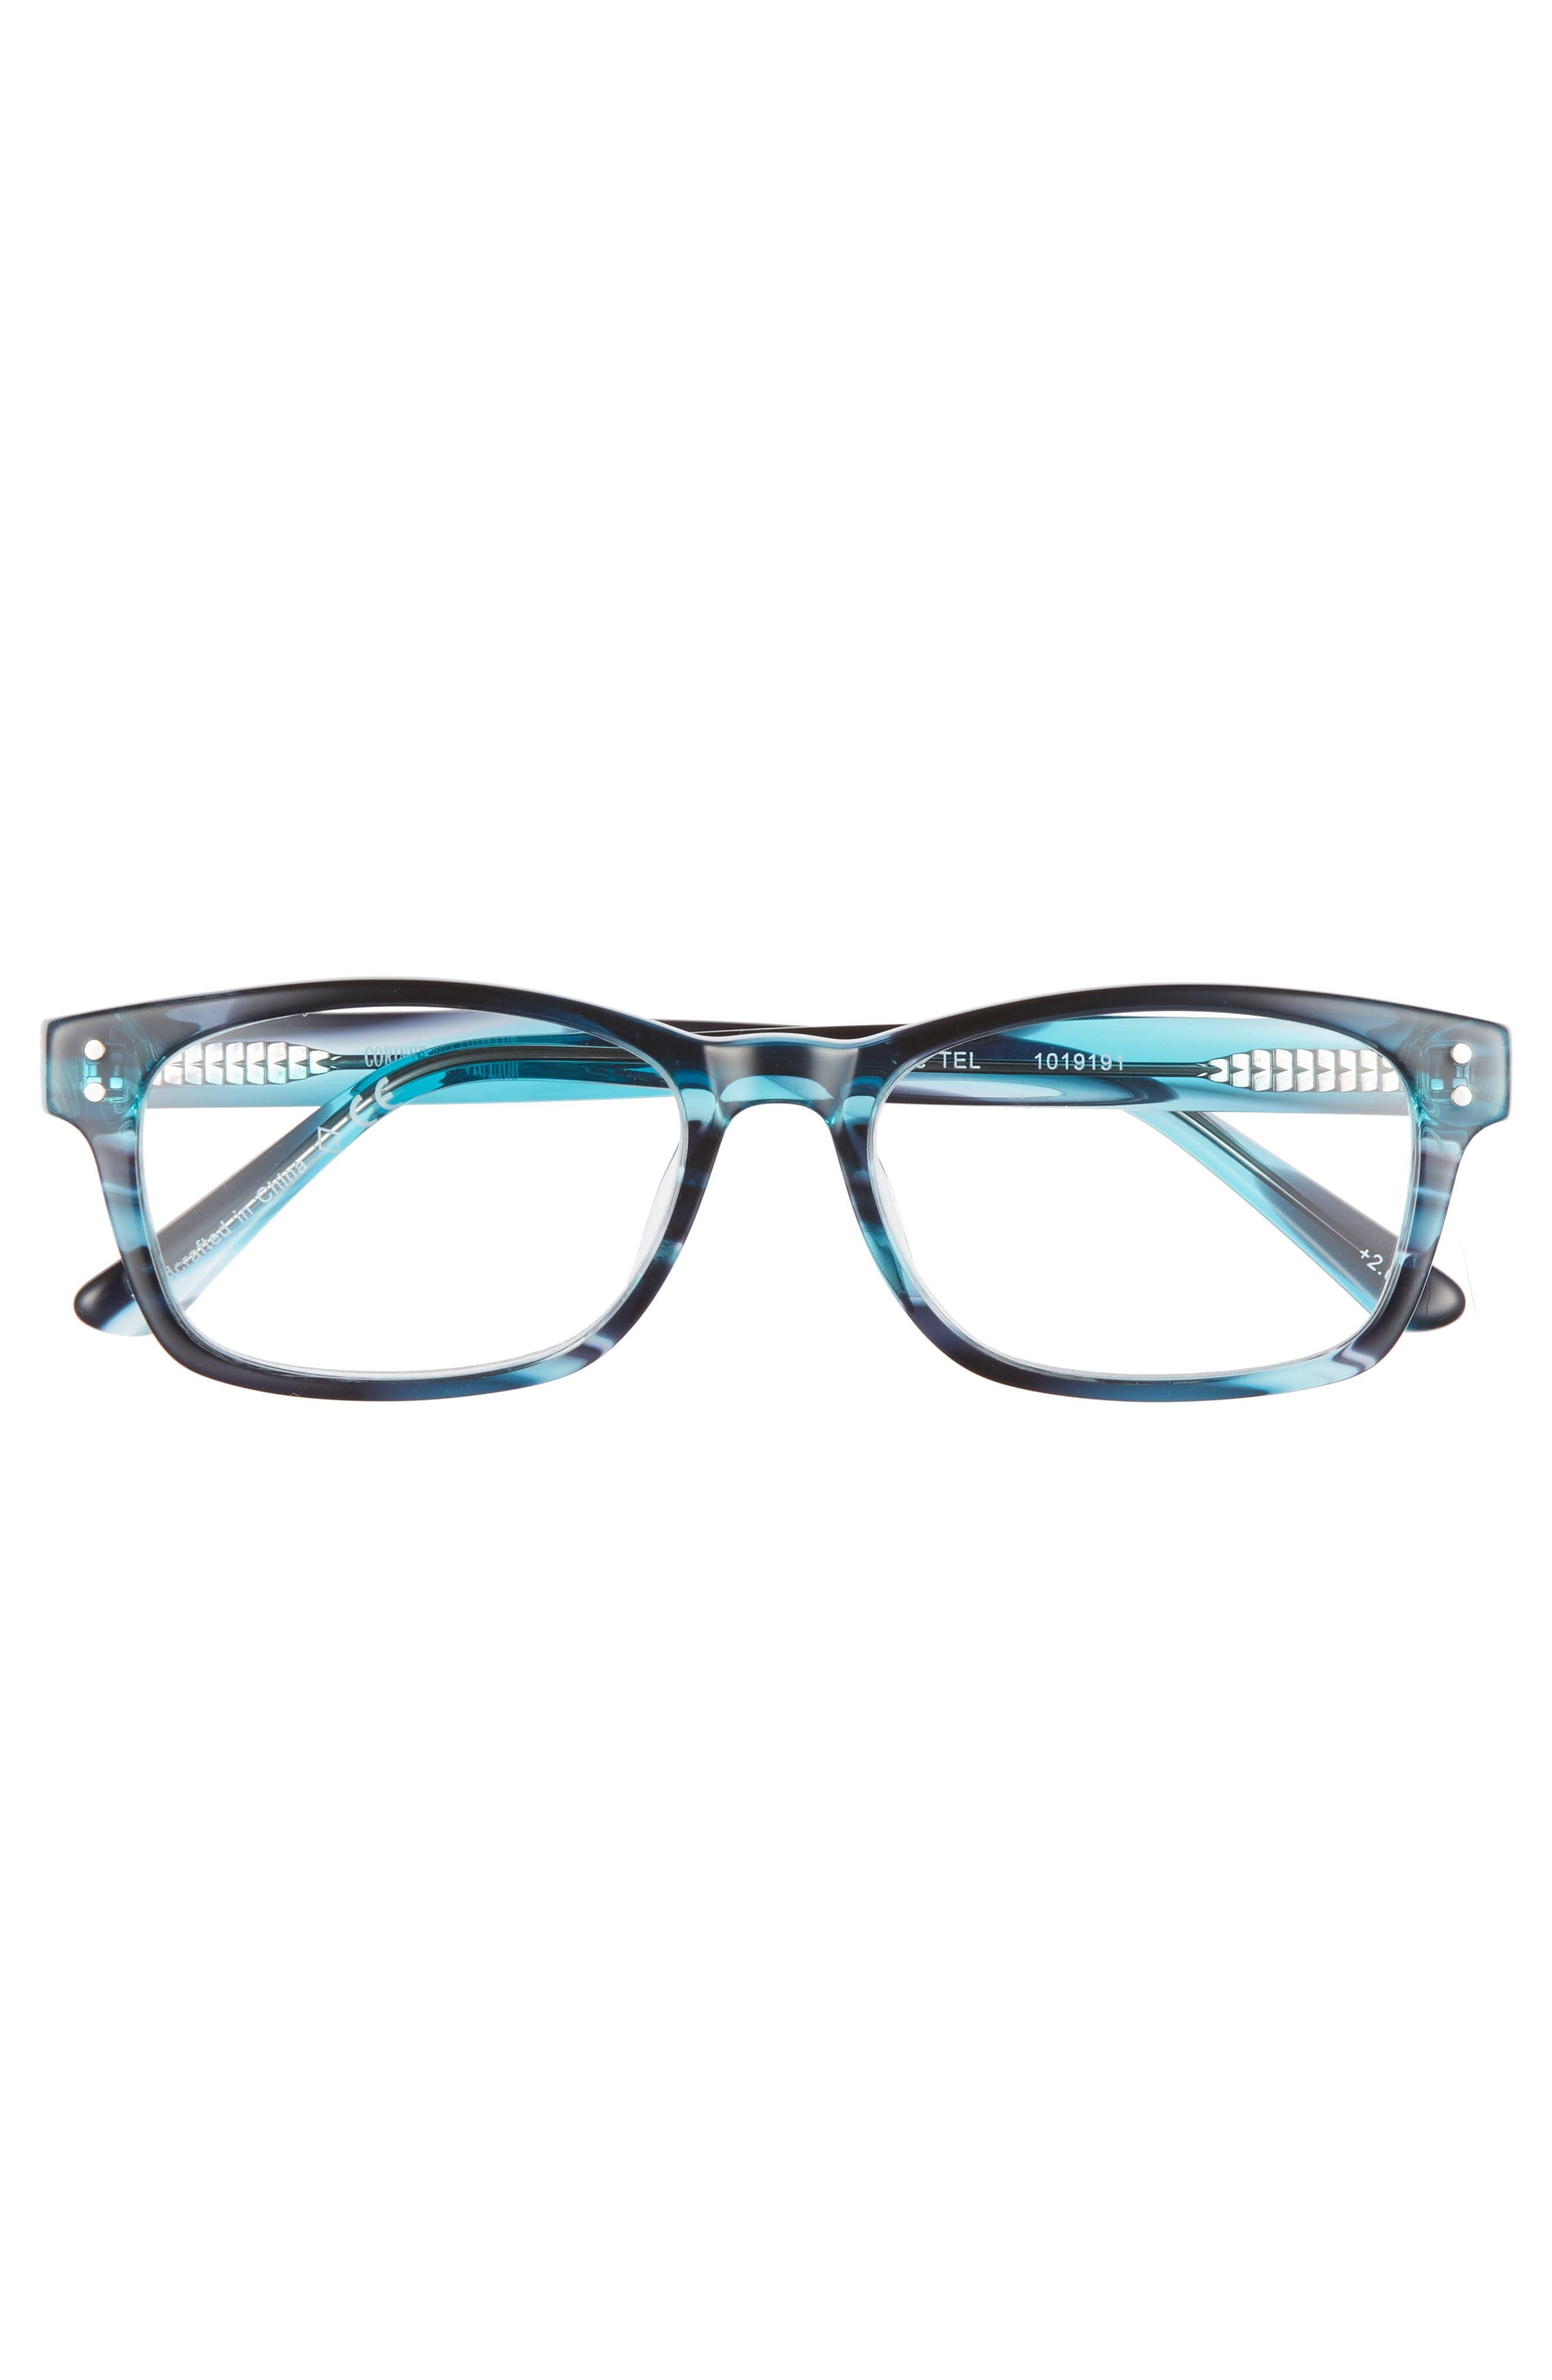 Edie 52mm Reading Glasses,                             Alternate thumbnail 3, color,                             TEAL BLUE